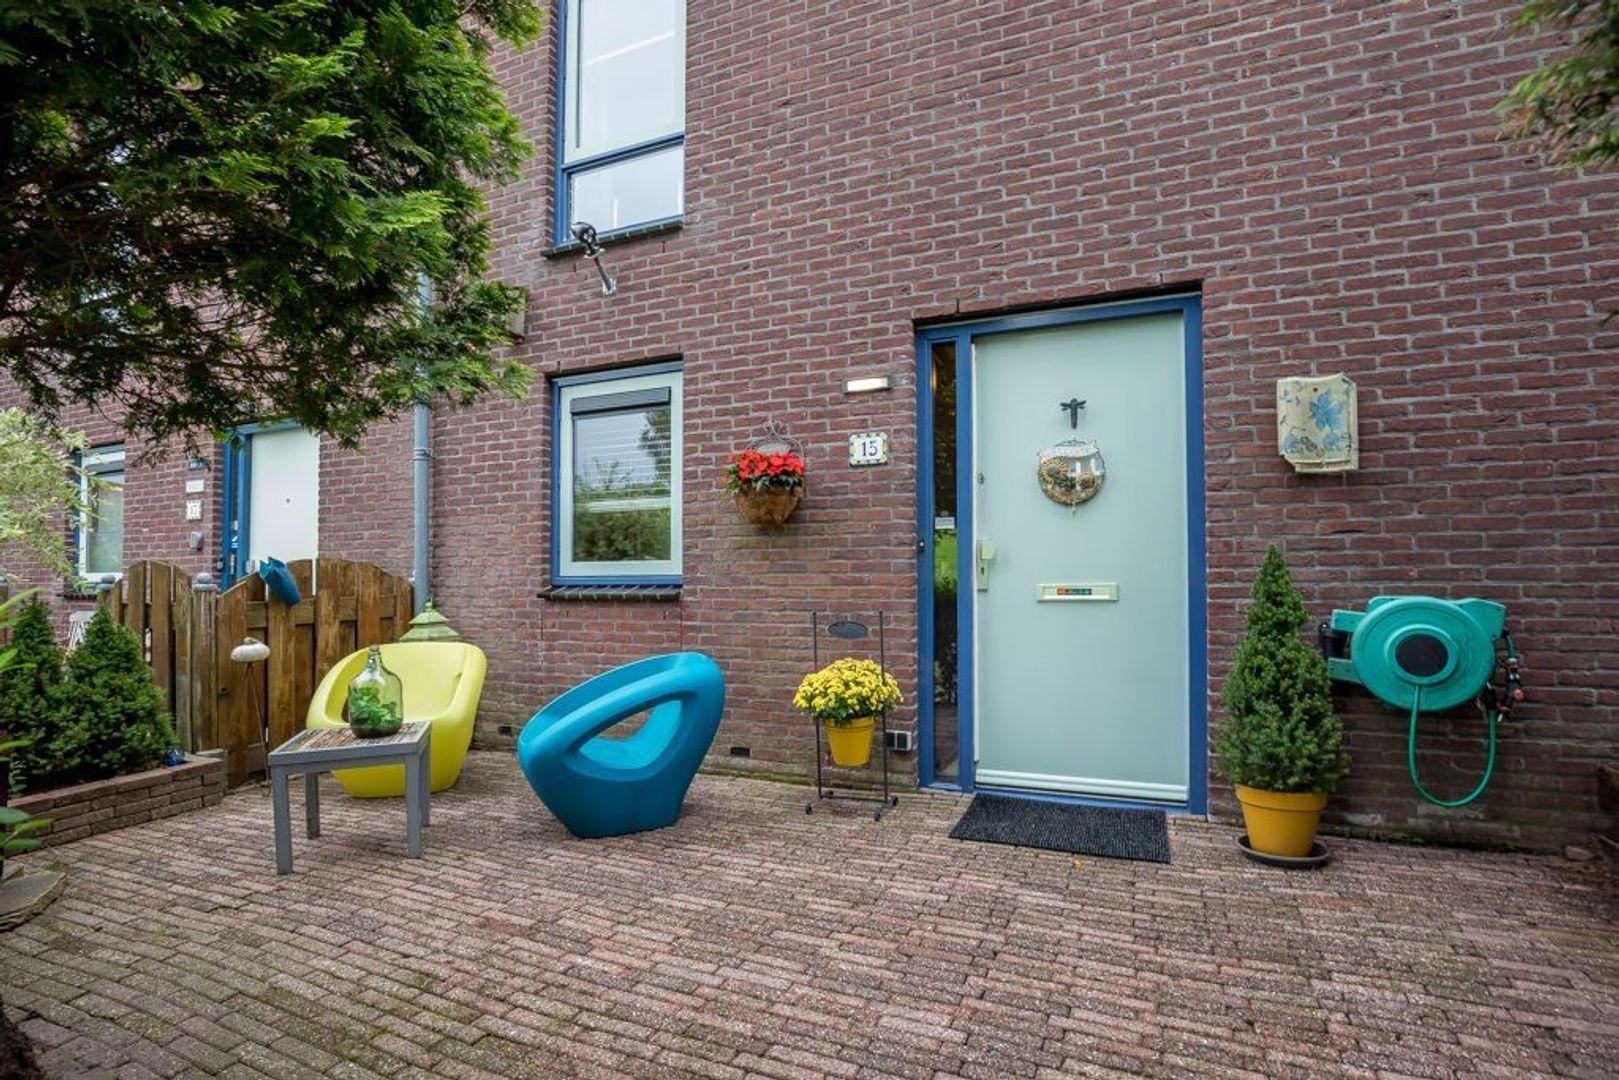 Balsahout 15, Zoetermeer foto-39